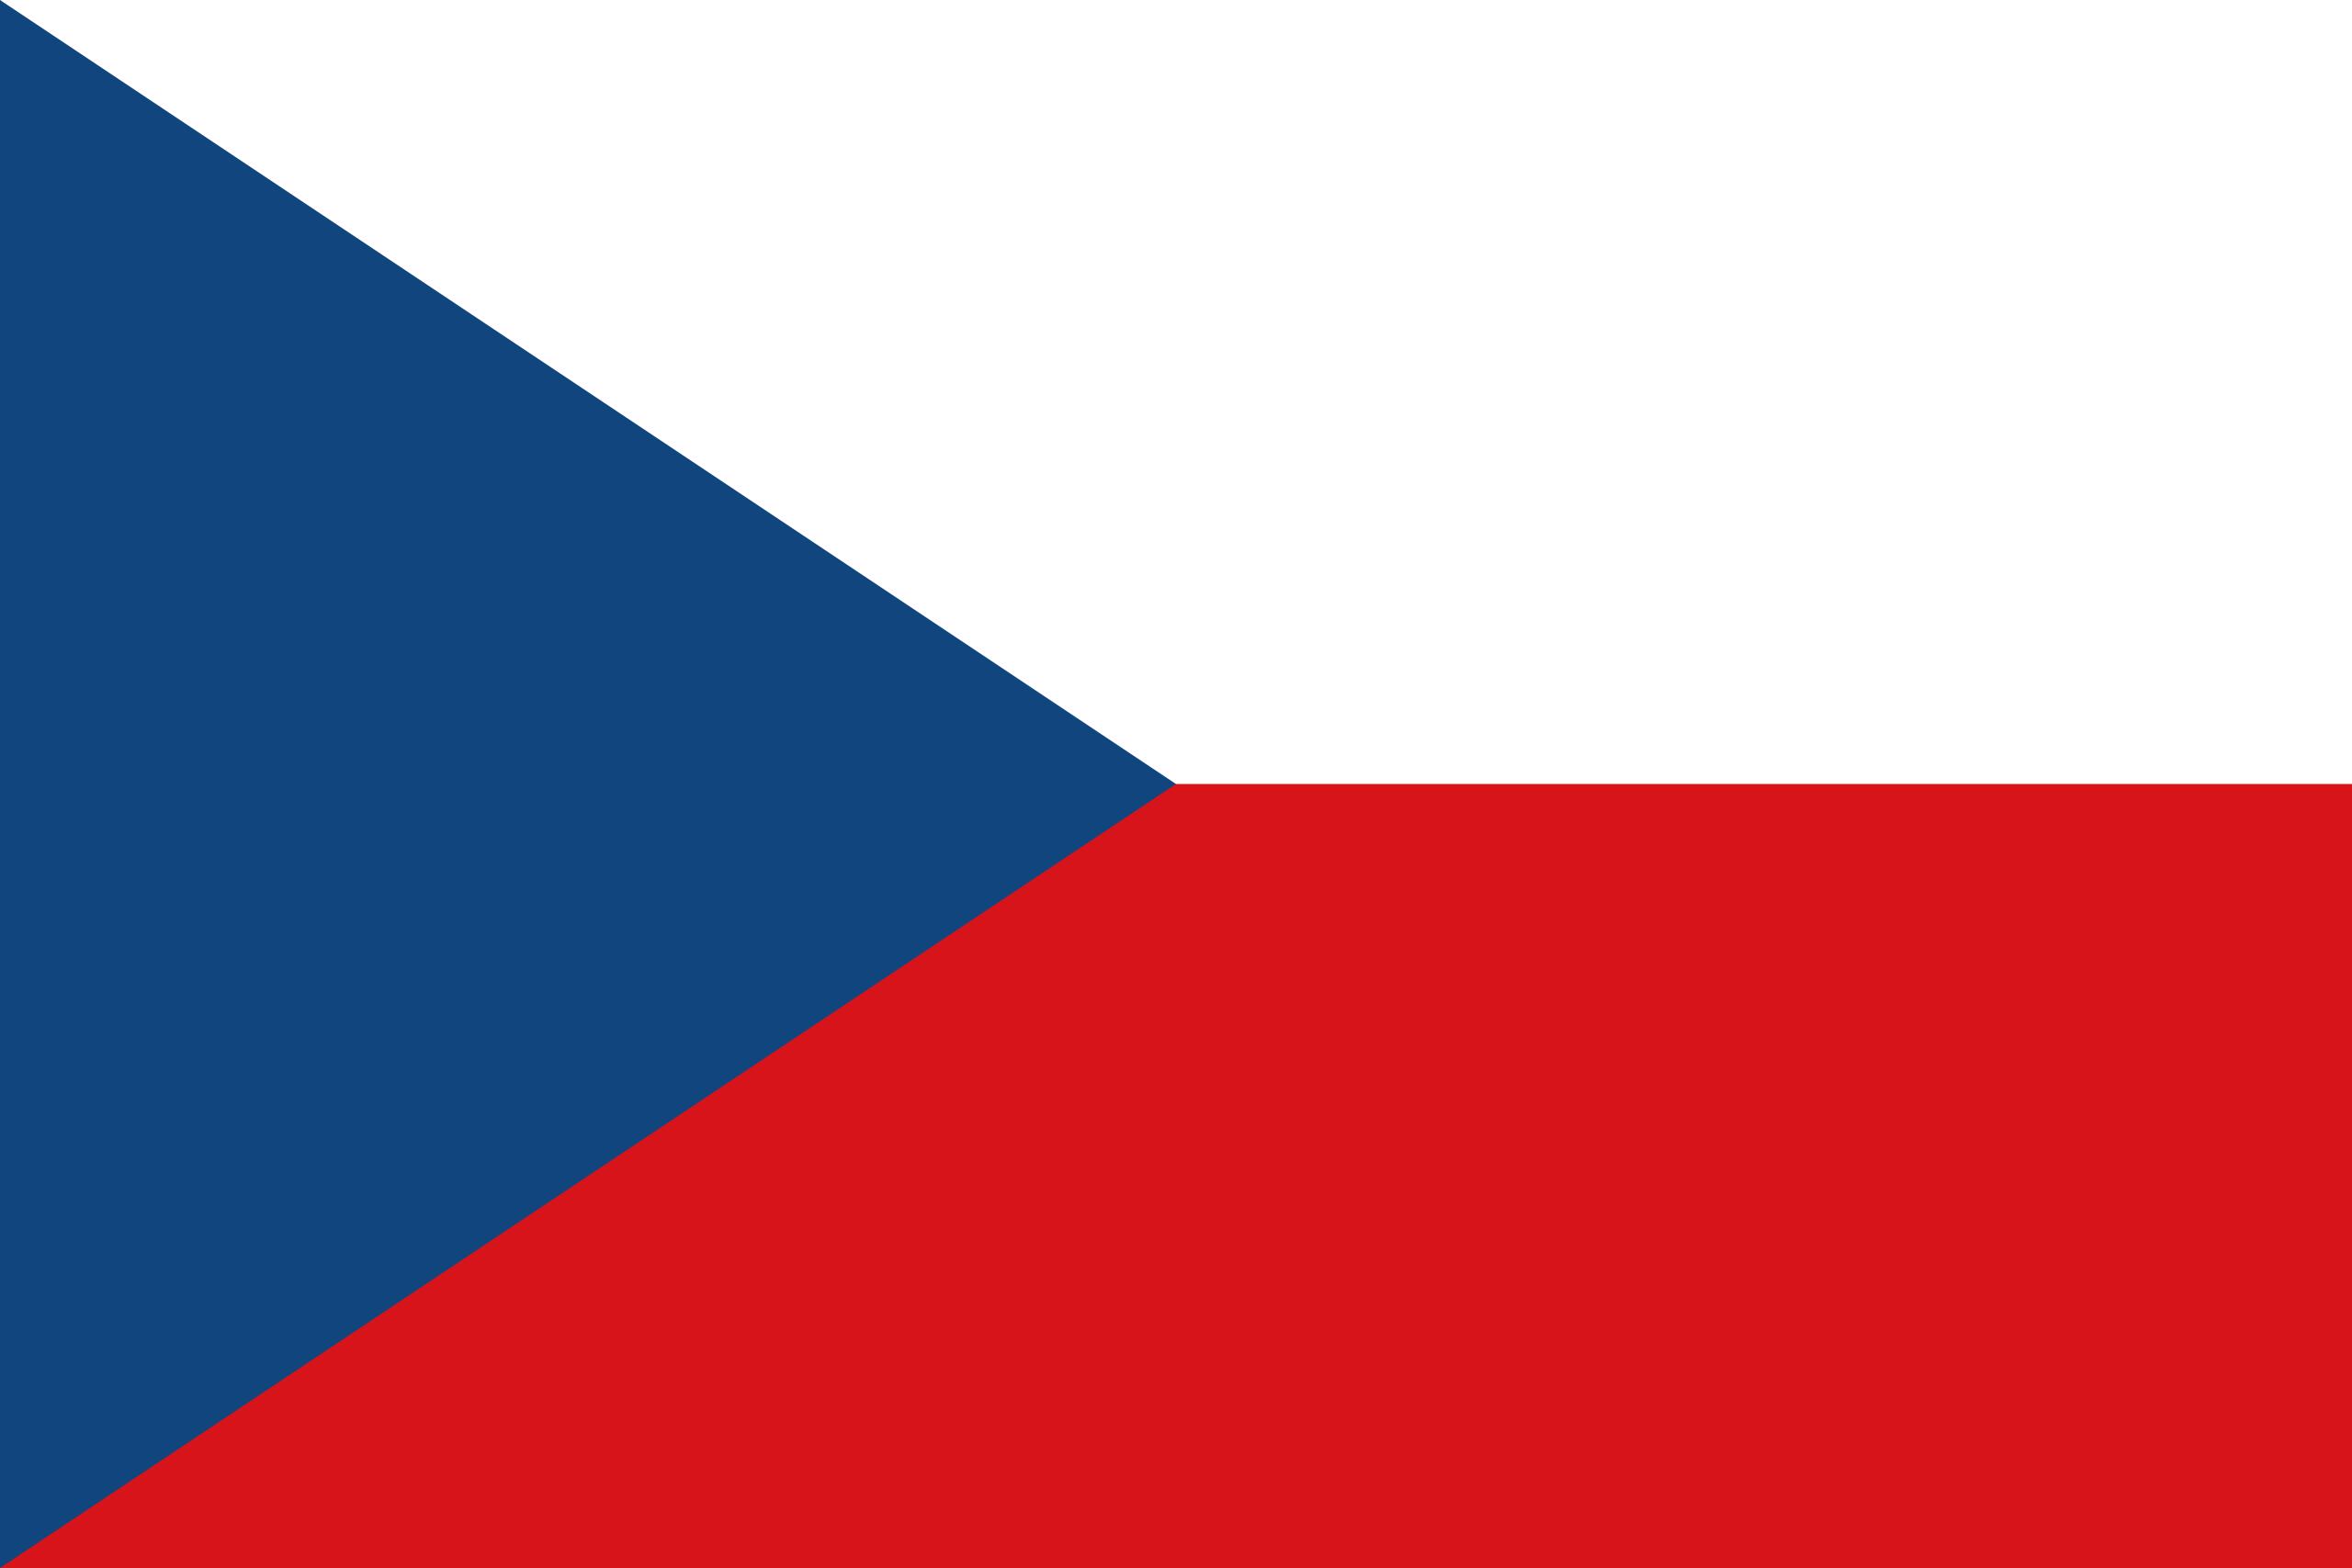 república checa, país, emblema, insignia, símbolo - Fondos de Pantalla HD - professor-falken.com